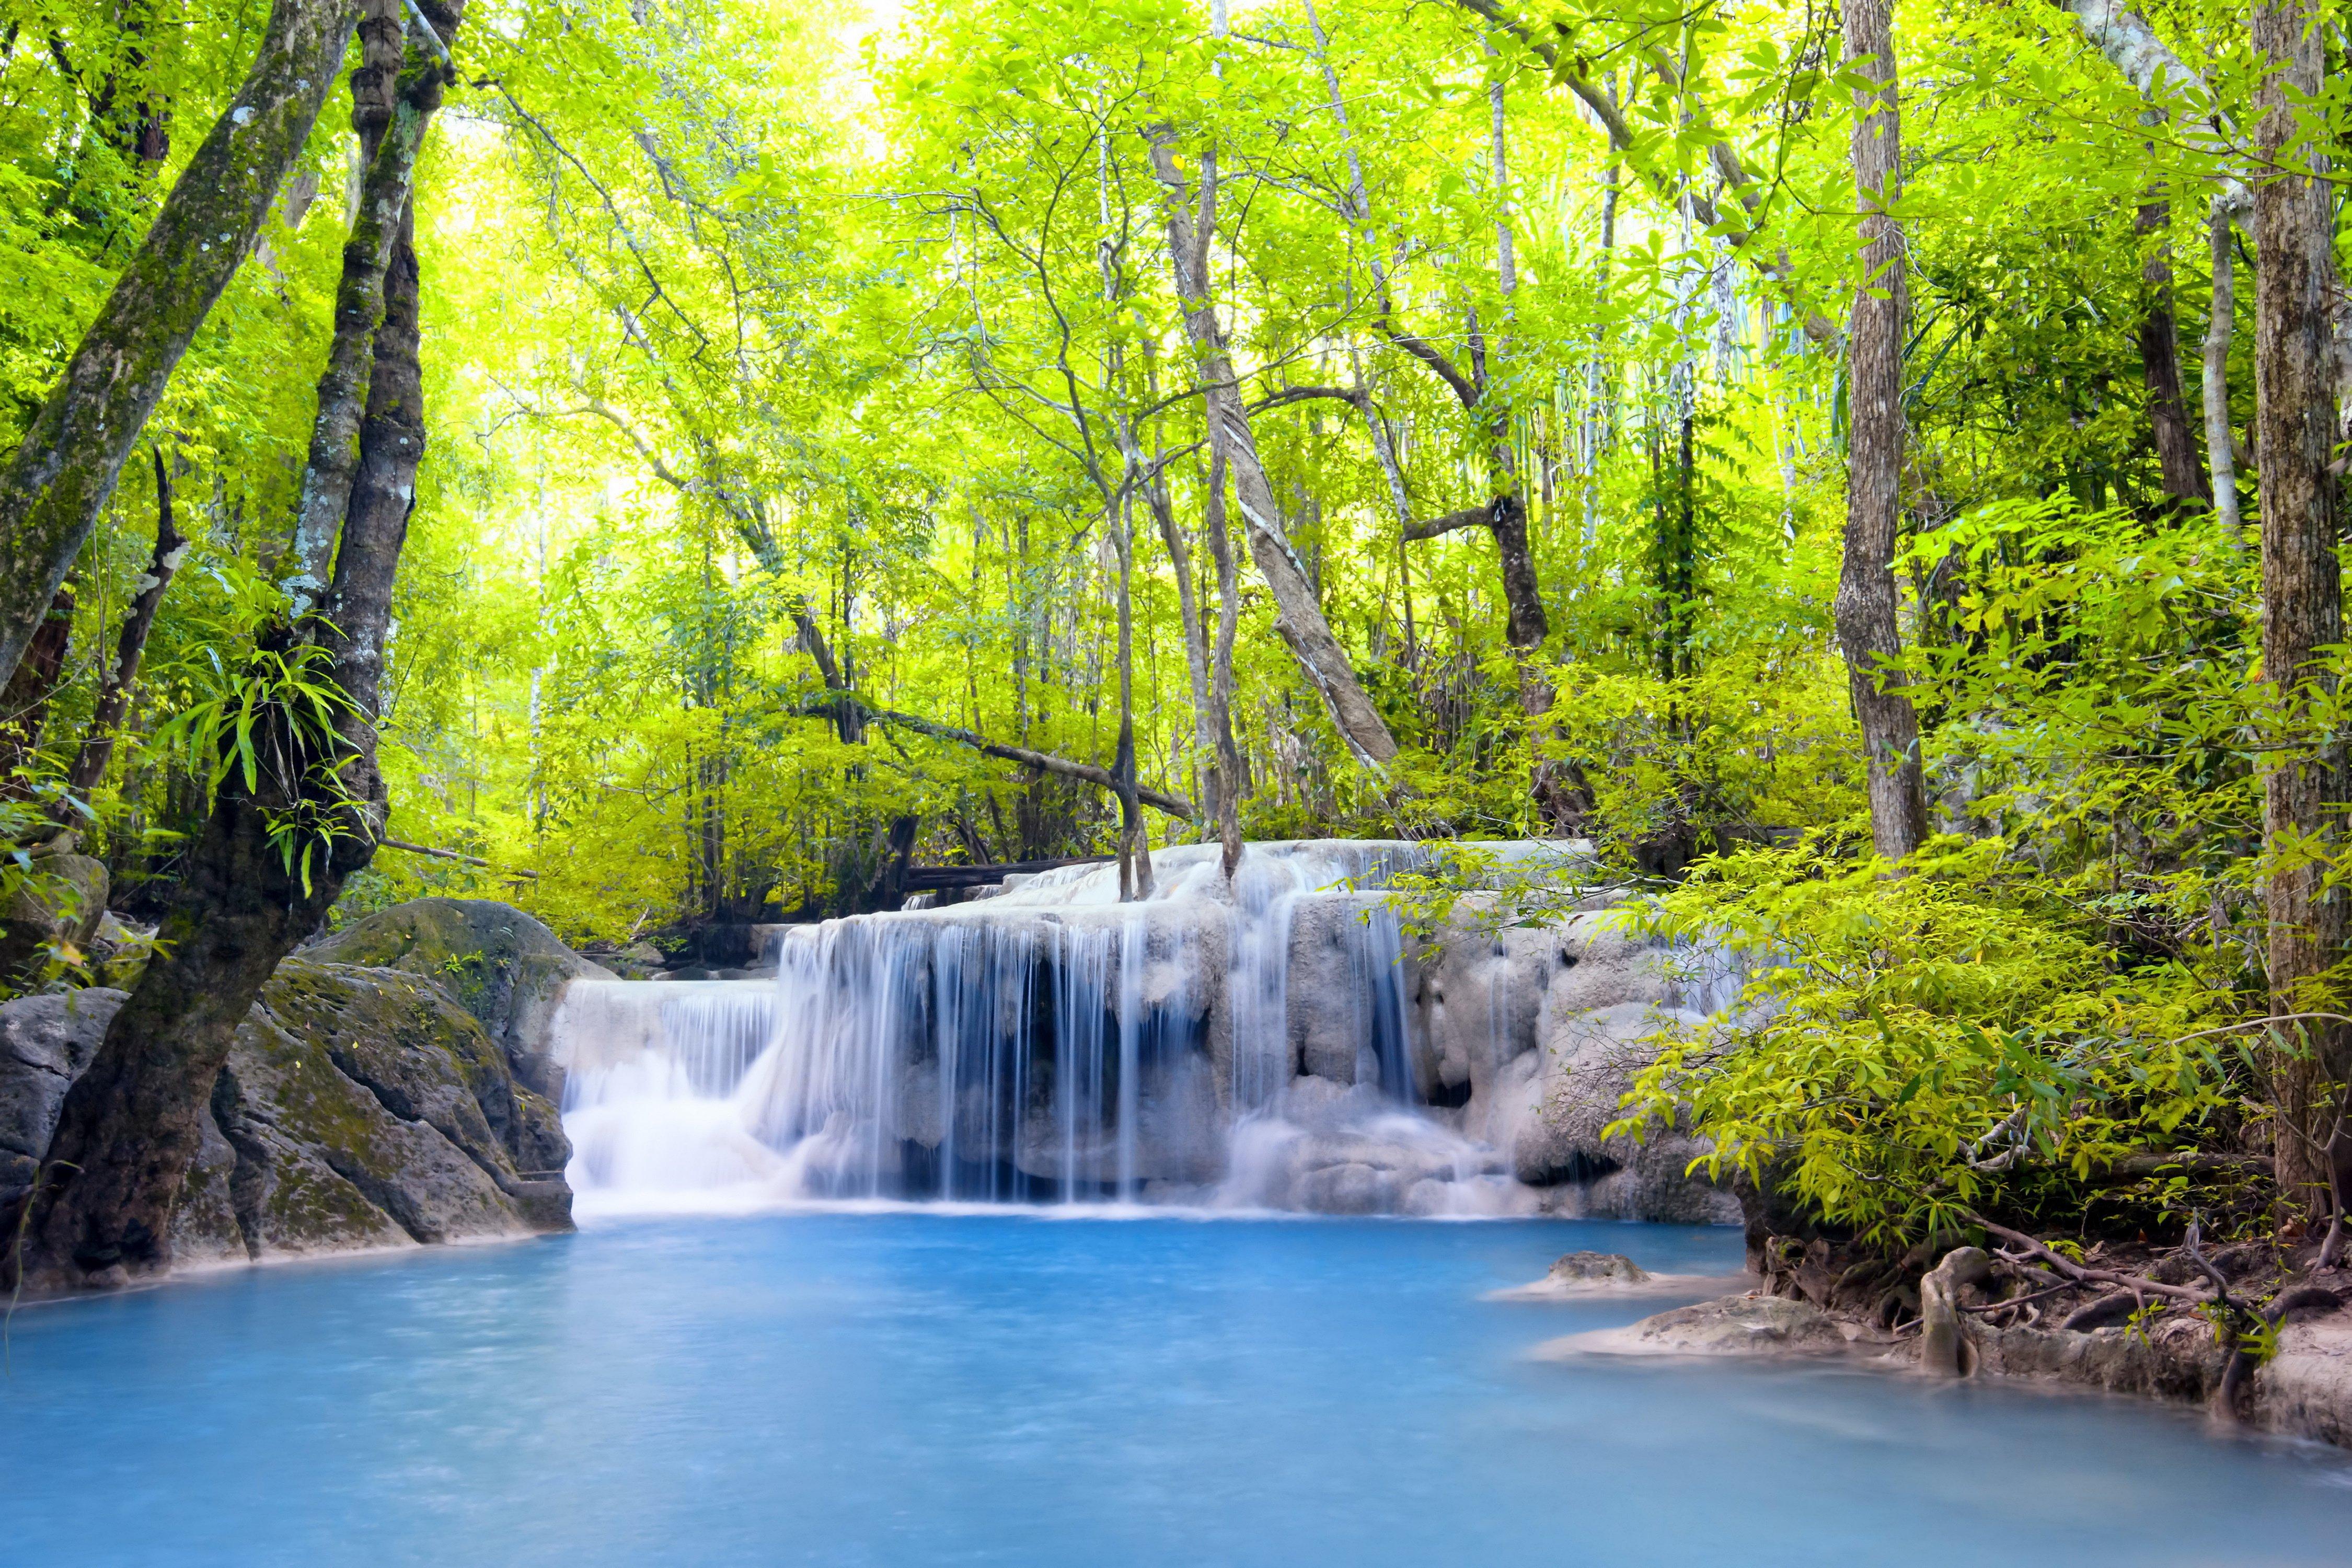 Waterfall River Waterfall Emerald Forest Landscape Forest Wallpaper 1